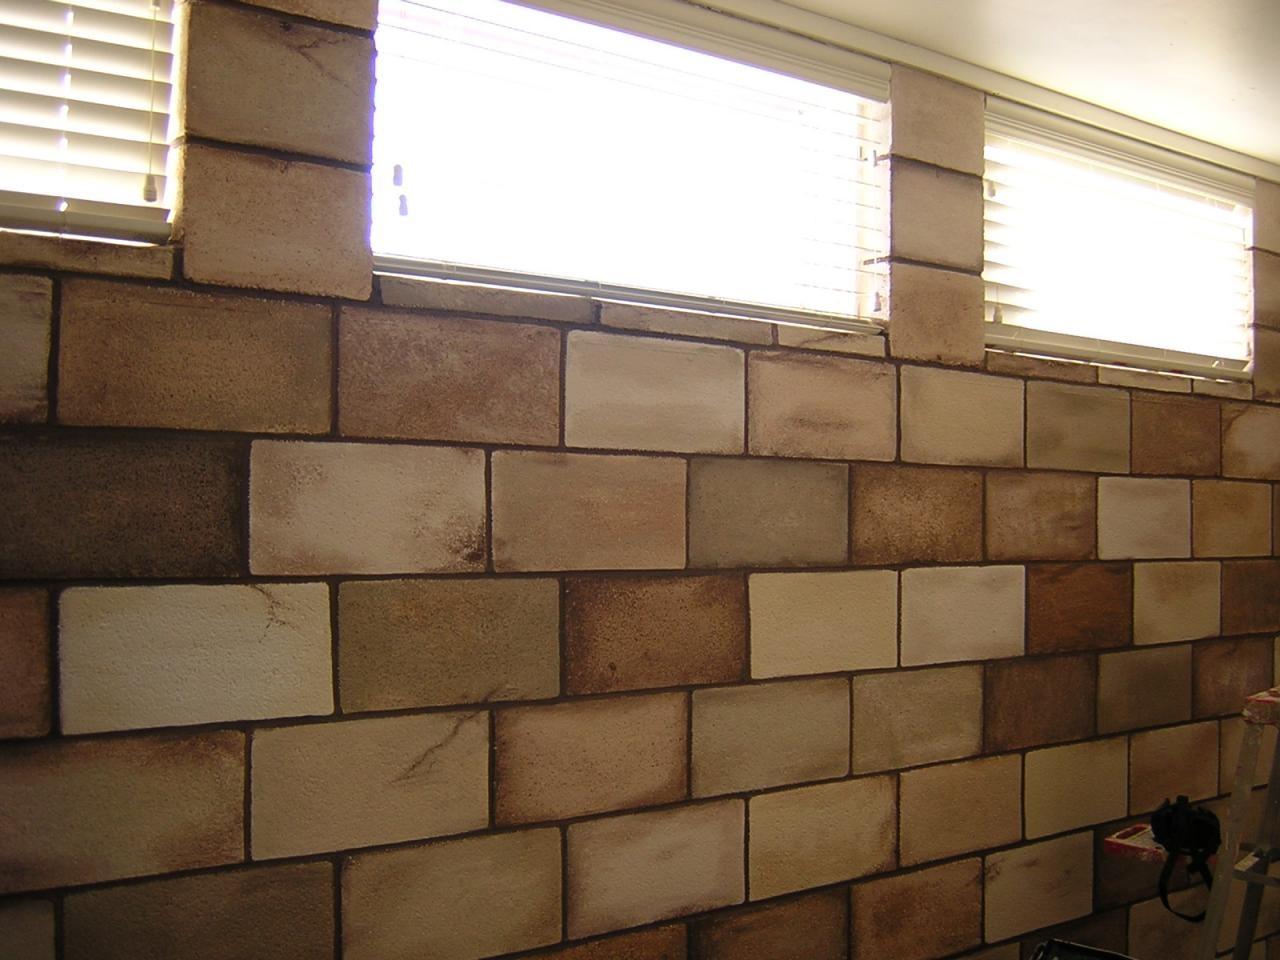 Basement Concrete Block Wall Ideas